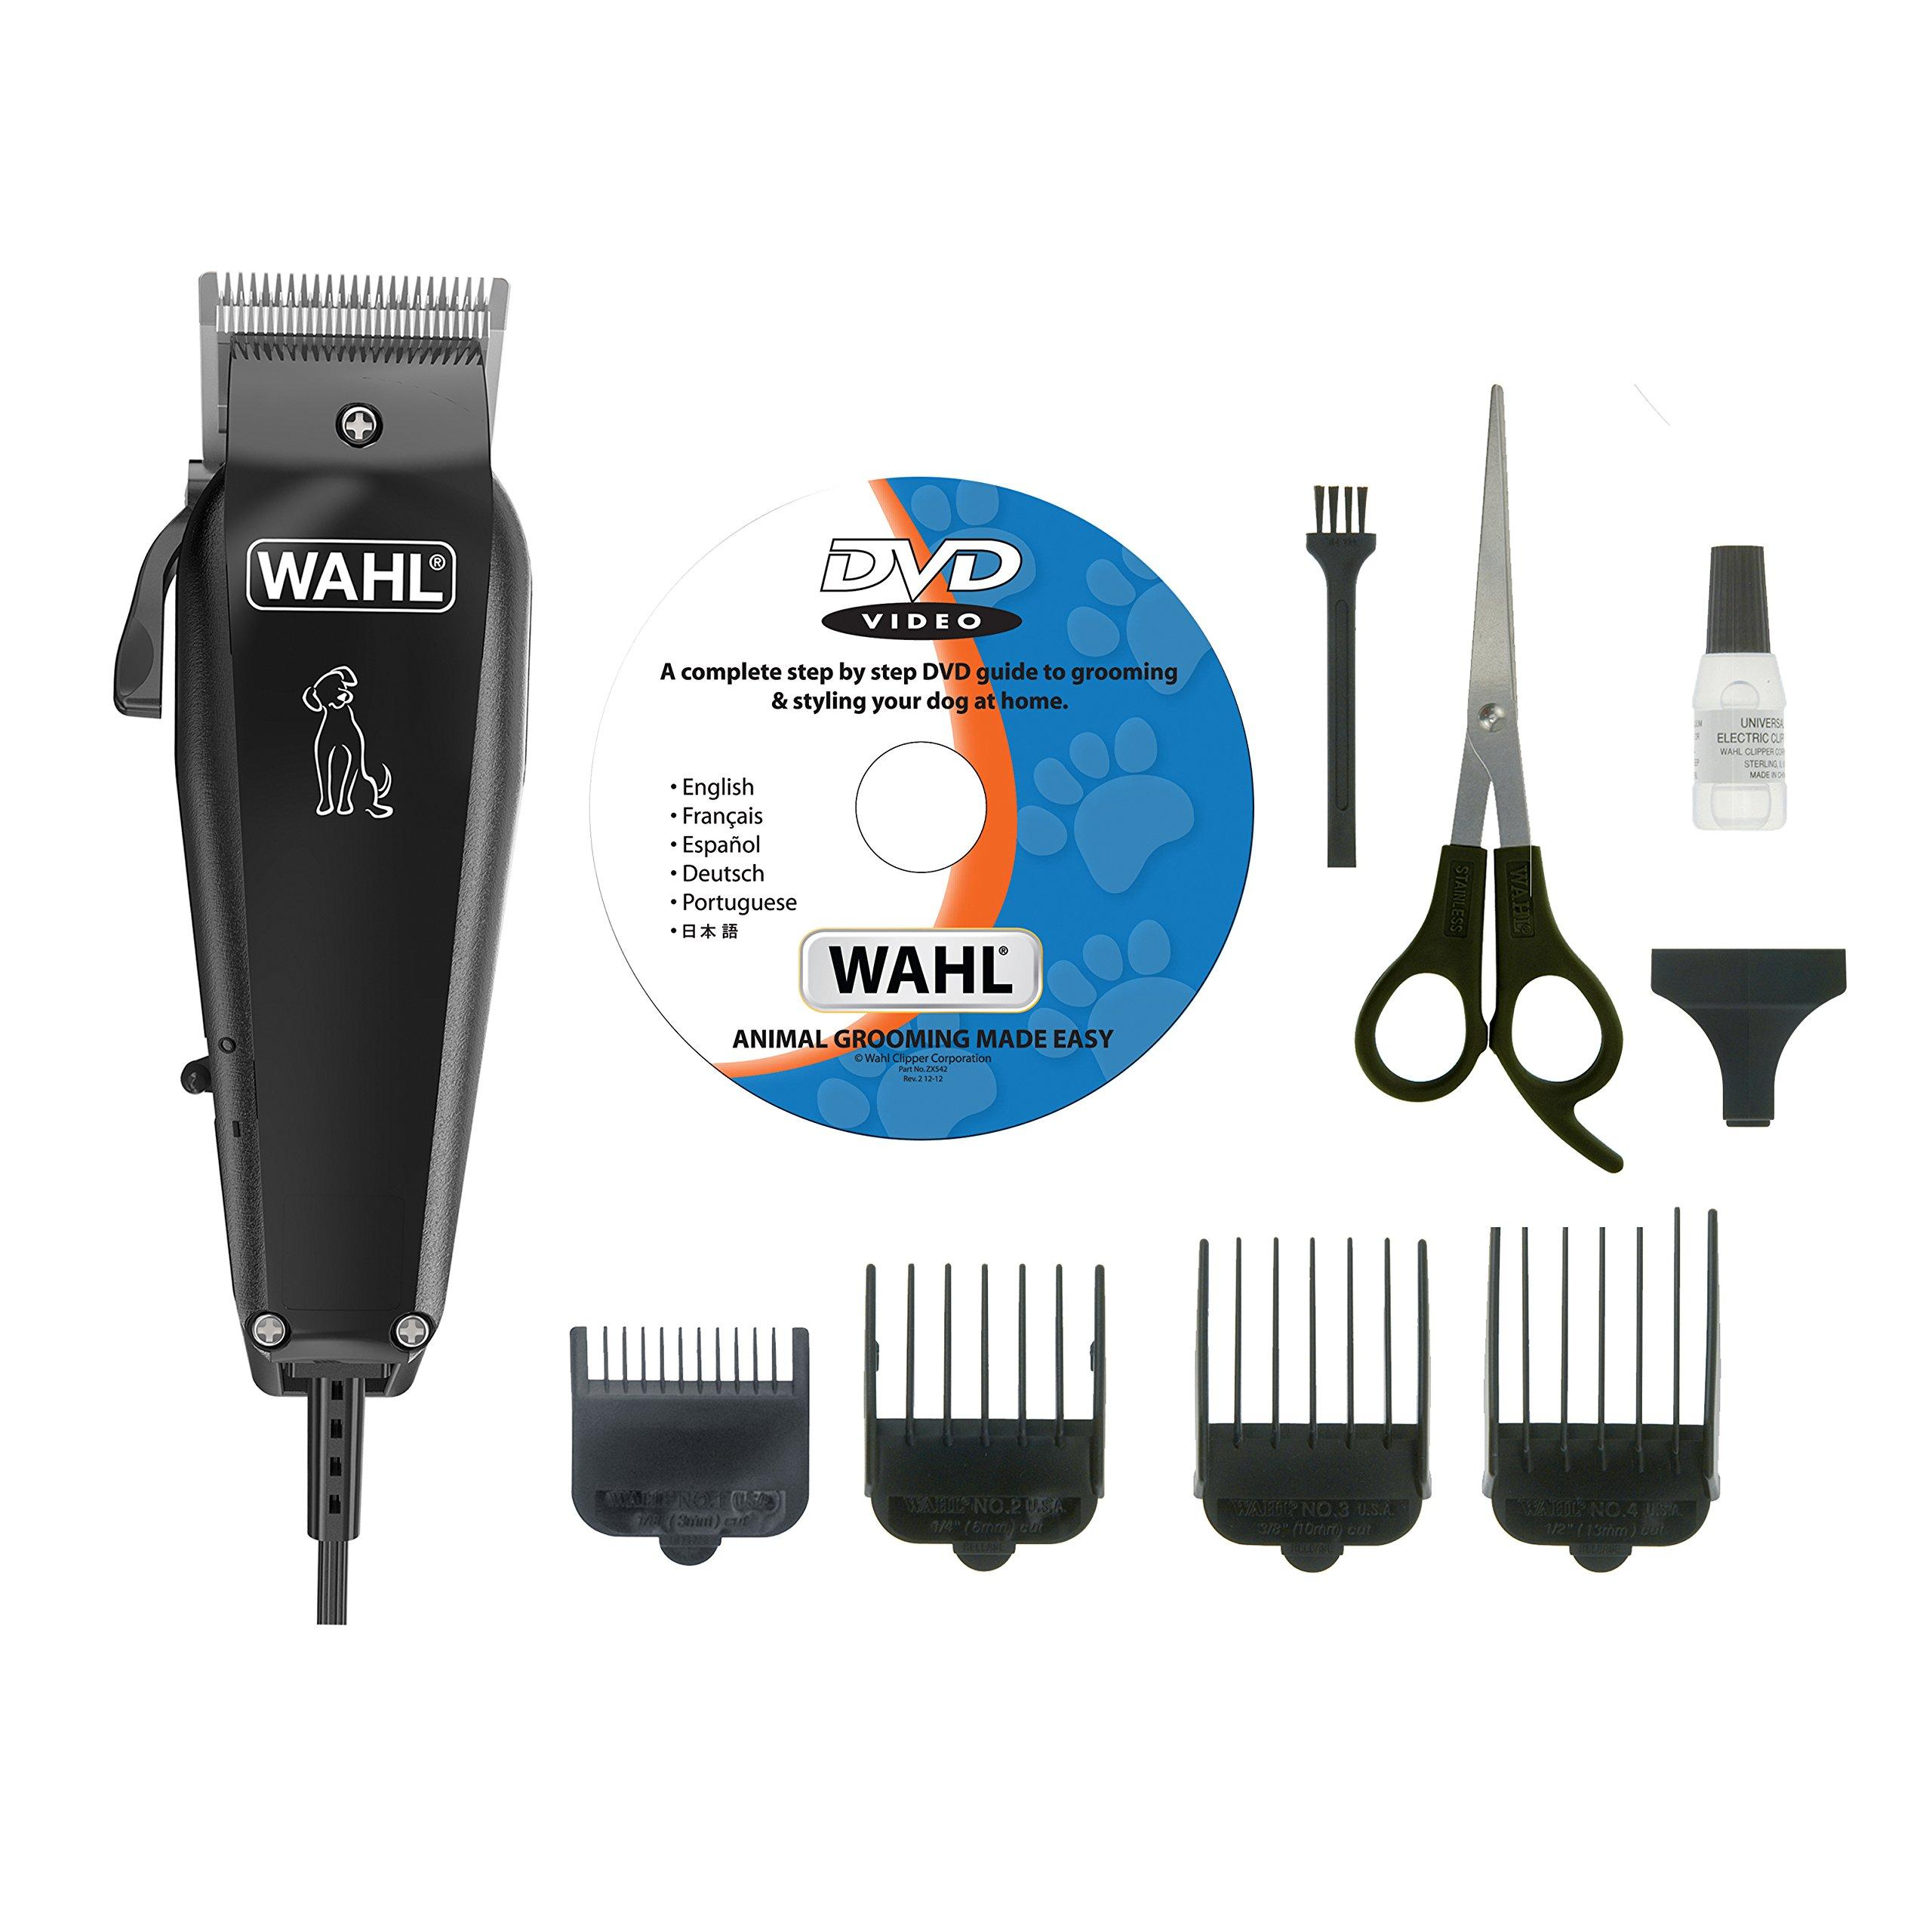 Wahl 9266-834 Multi Cut Professional Grooming Animal Dog Clipper Kit [black] B+